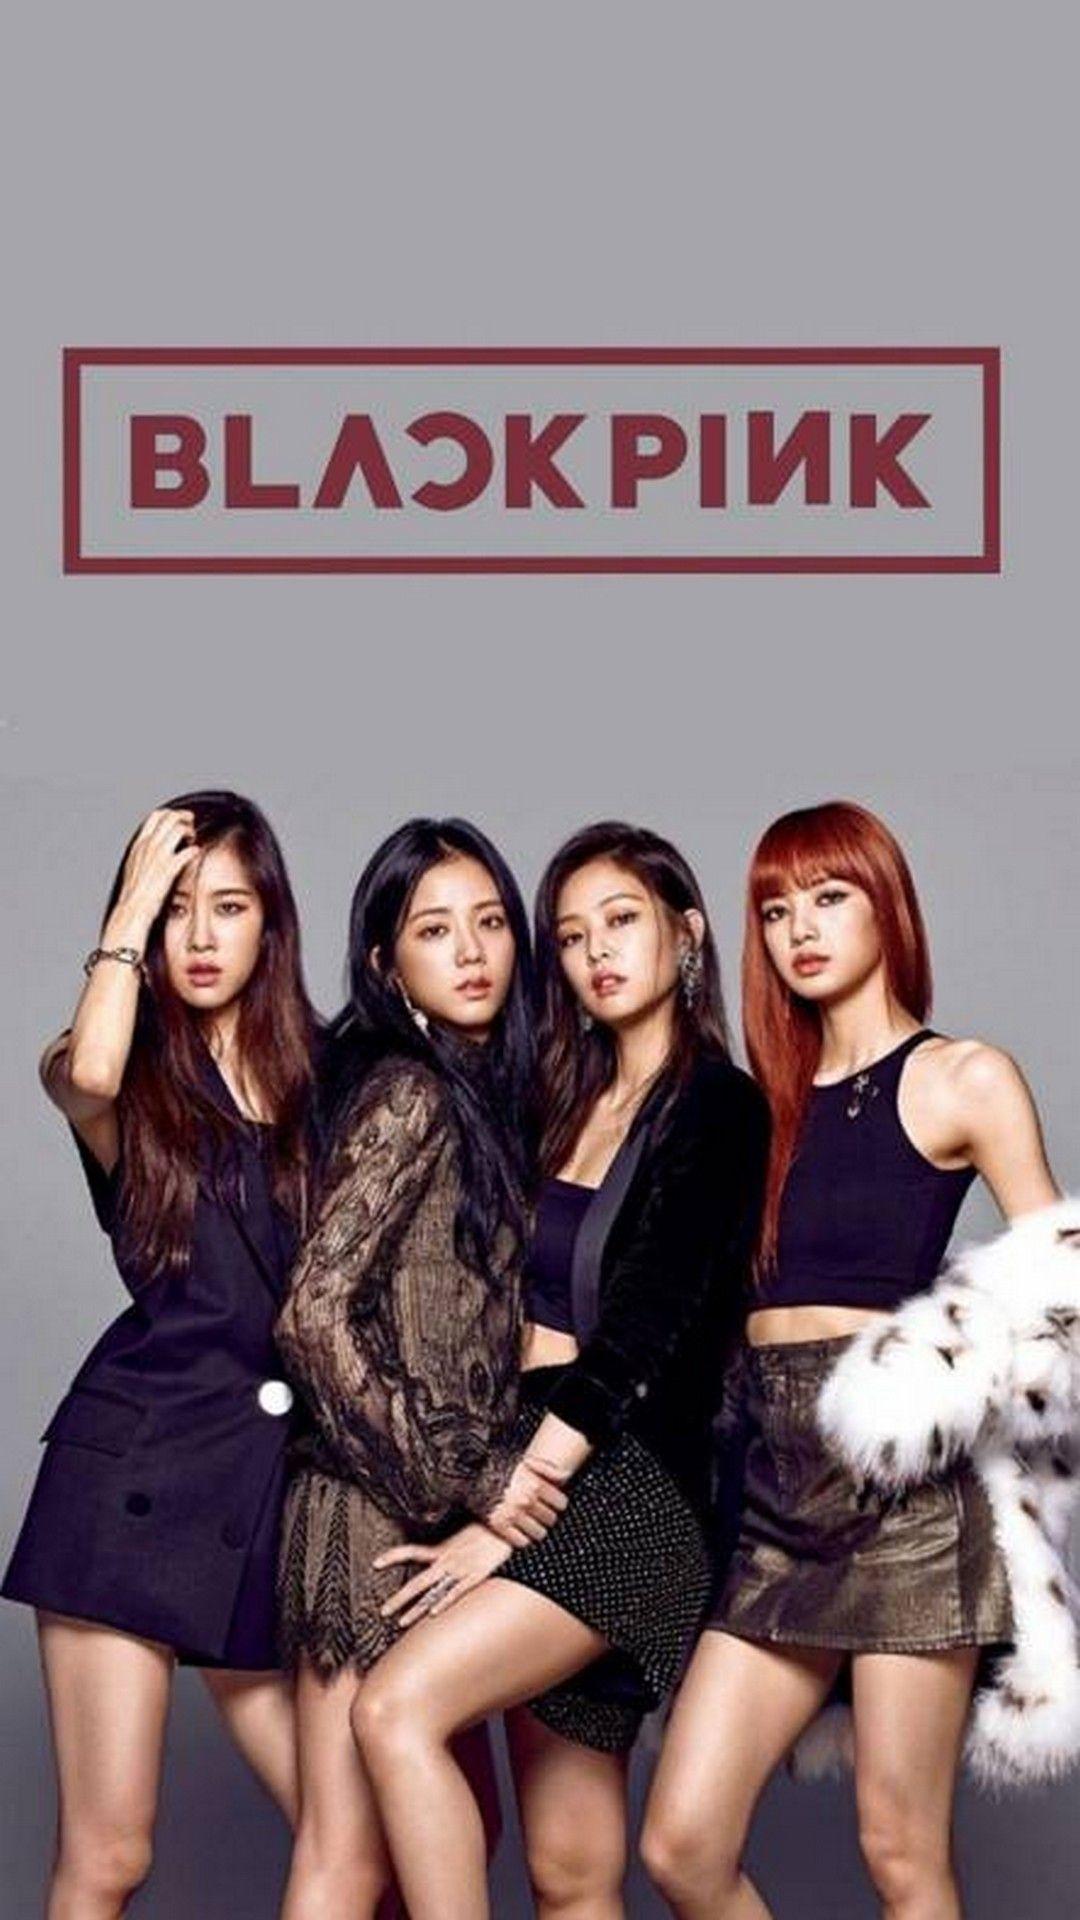 Fashion Magazine Wallpaper Hd In 2020 Blackpink Fashion Blackpink Black Pink Kpop